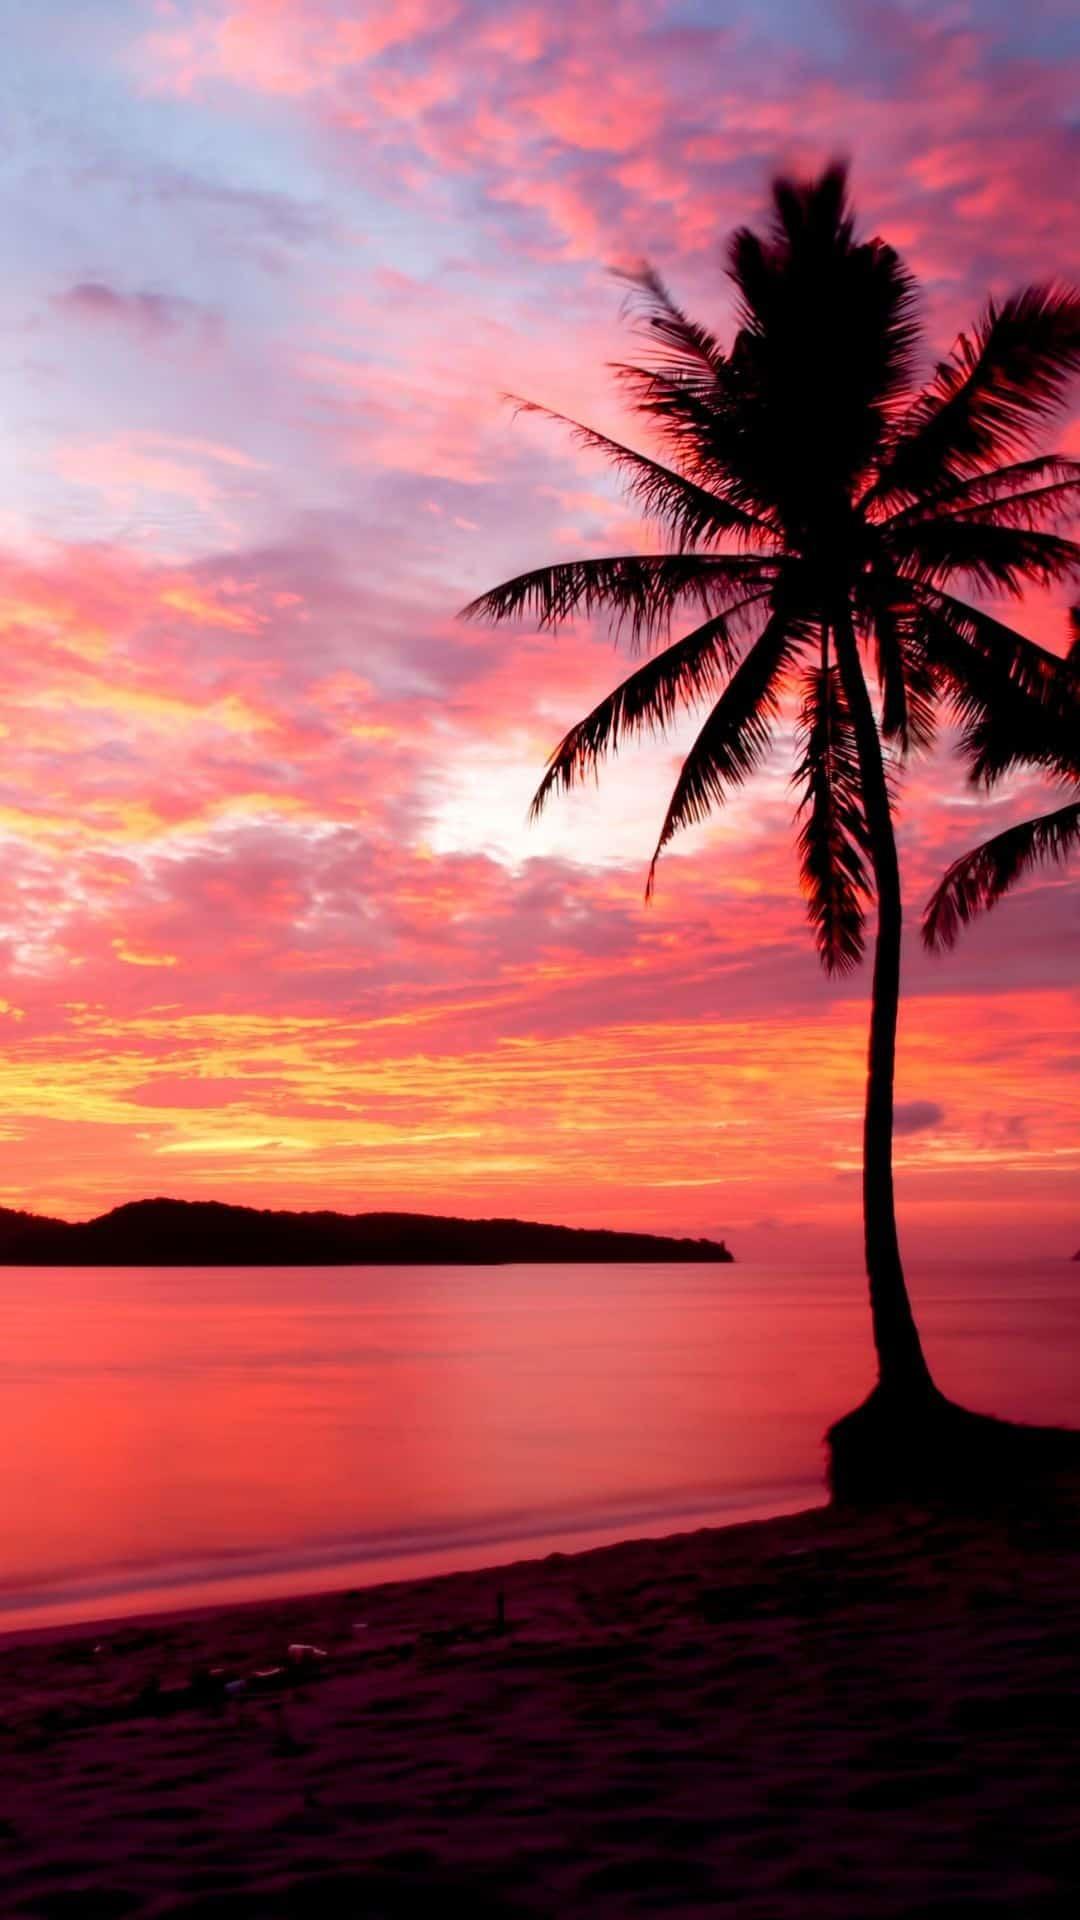 Sunset iphone Wallpaper